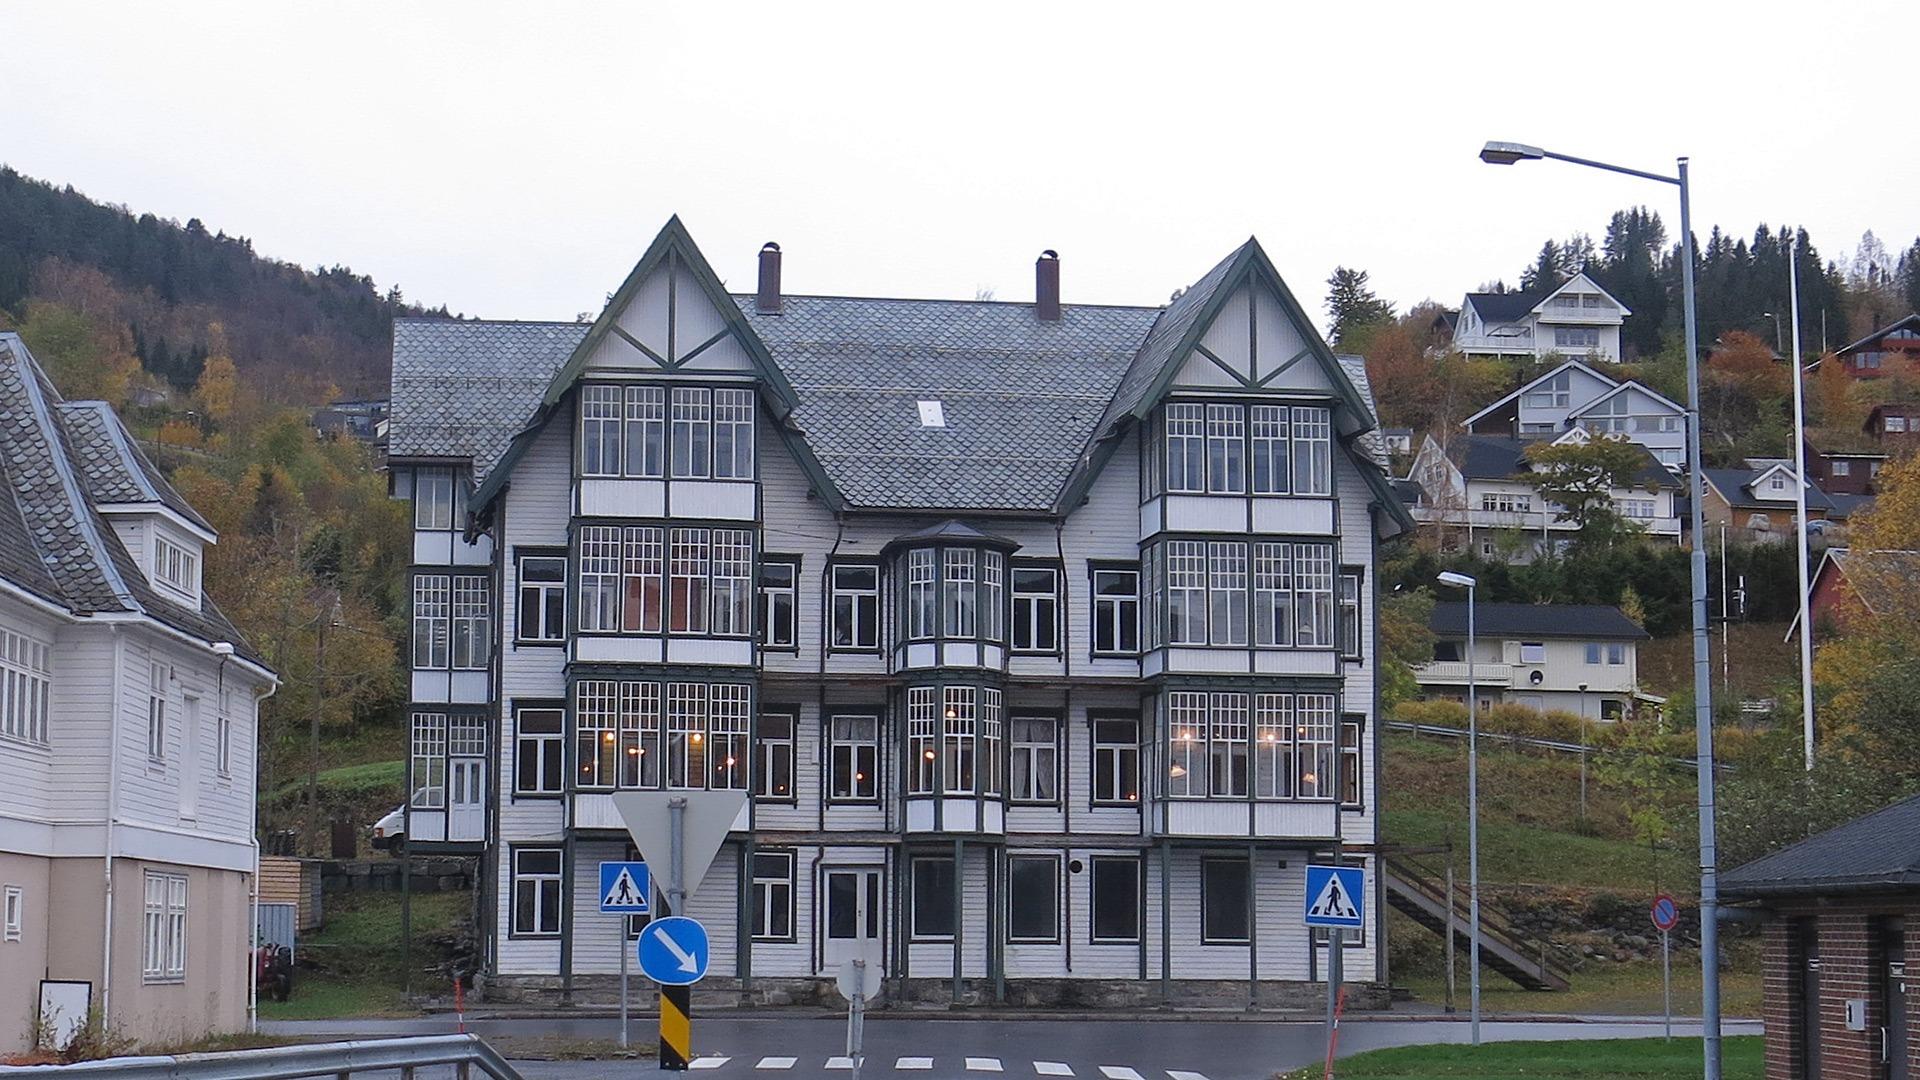 Bilde av Sjøholt Hotell. Jorun Elisabet Aresvik Hals, Riksantikvaren